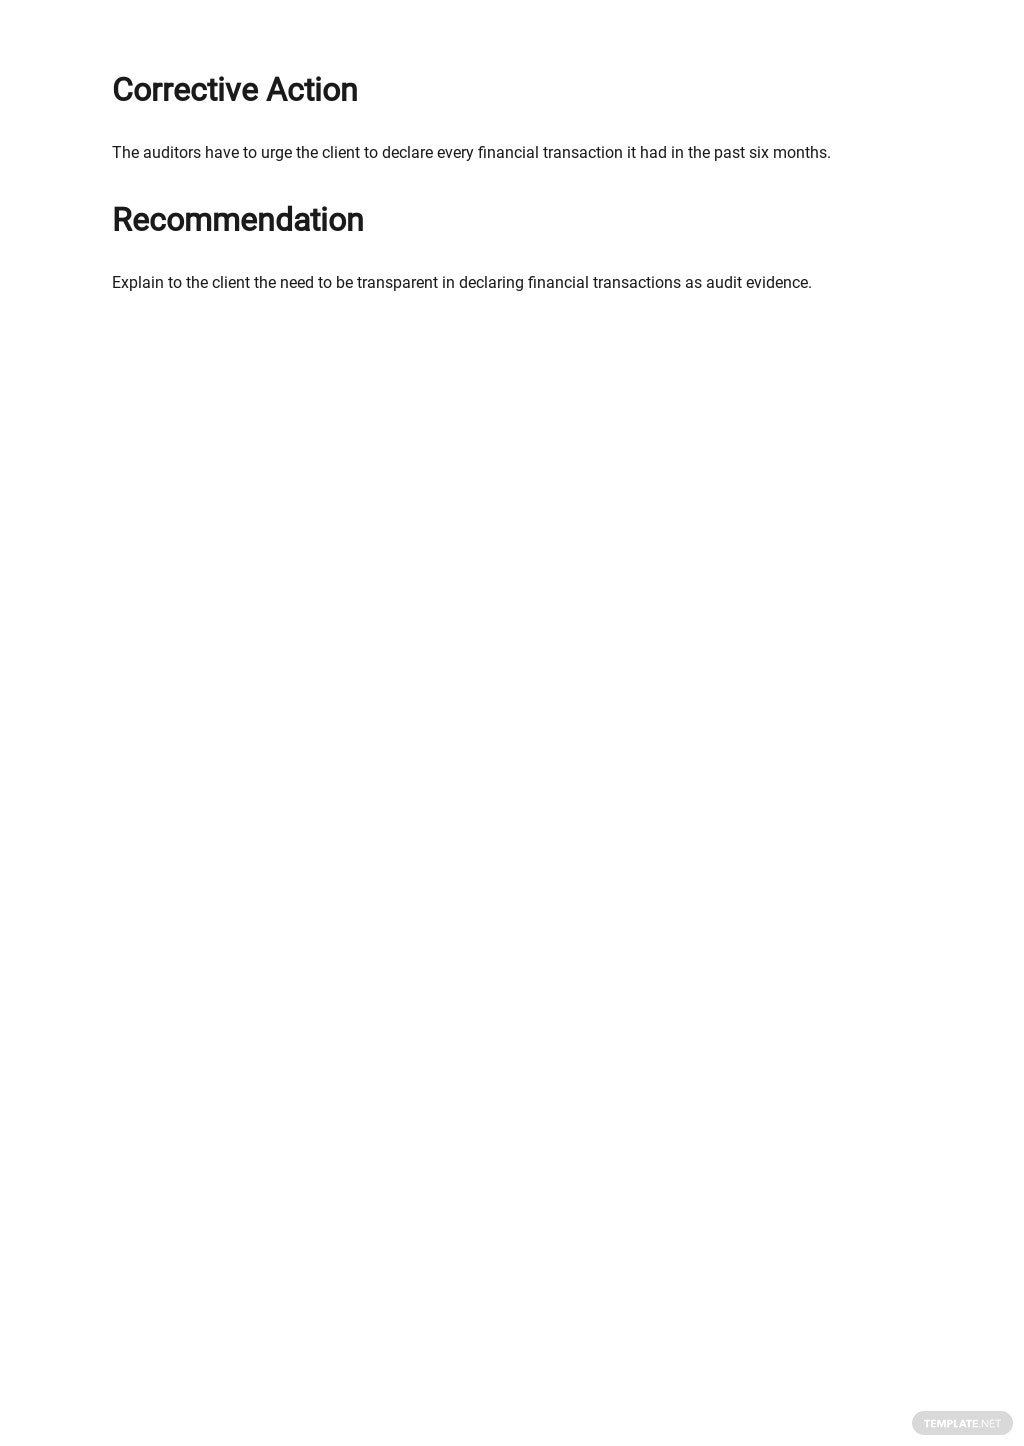 Free Audit Non conformance Report Template 2.jpe